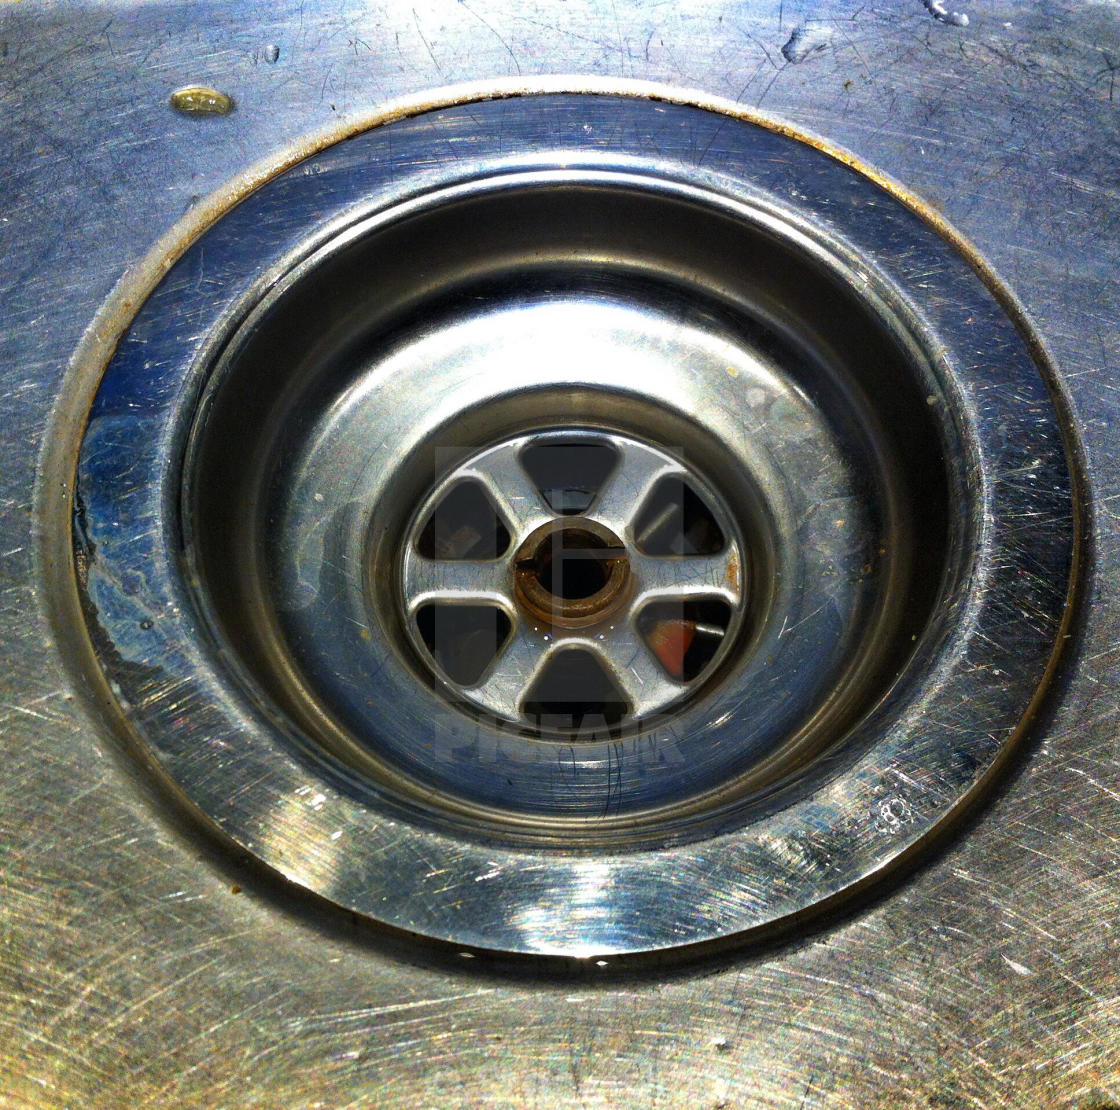 Stainless steel kitchen sink plug hole - License, download ...